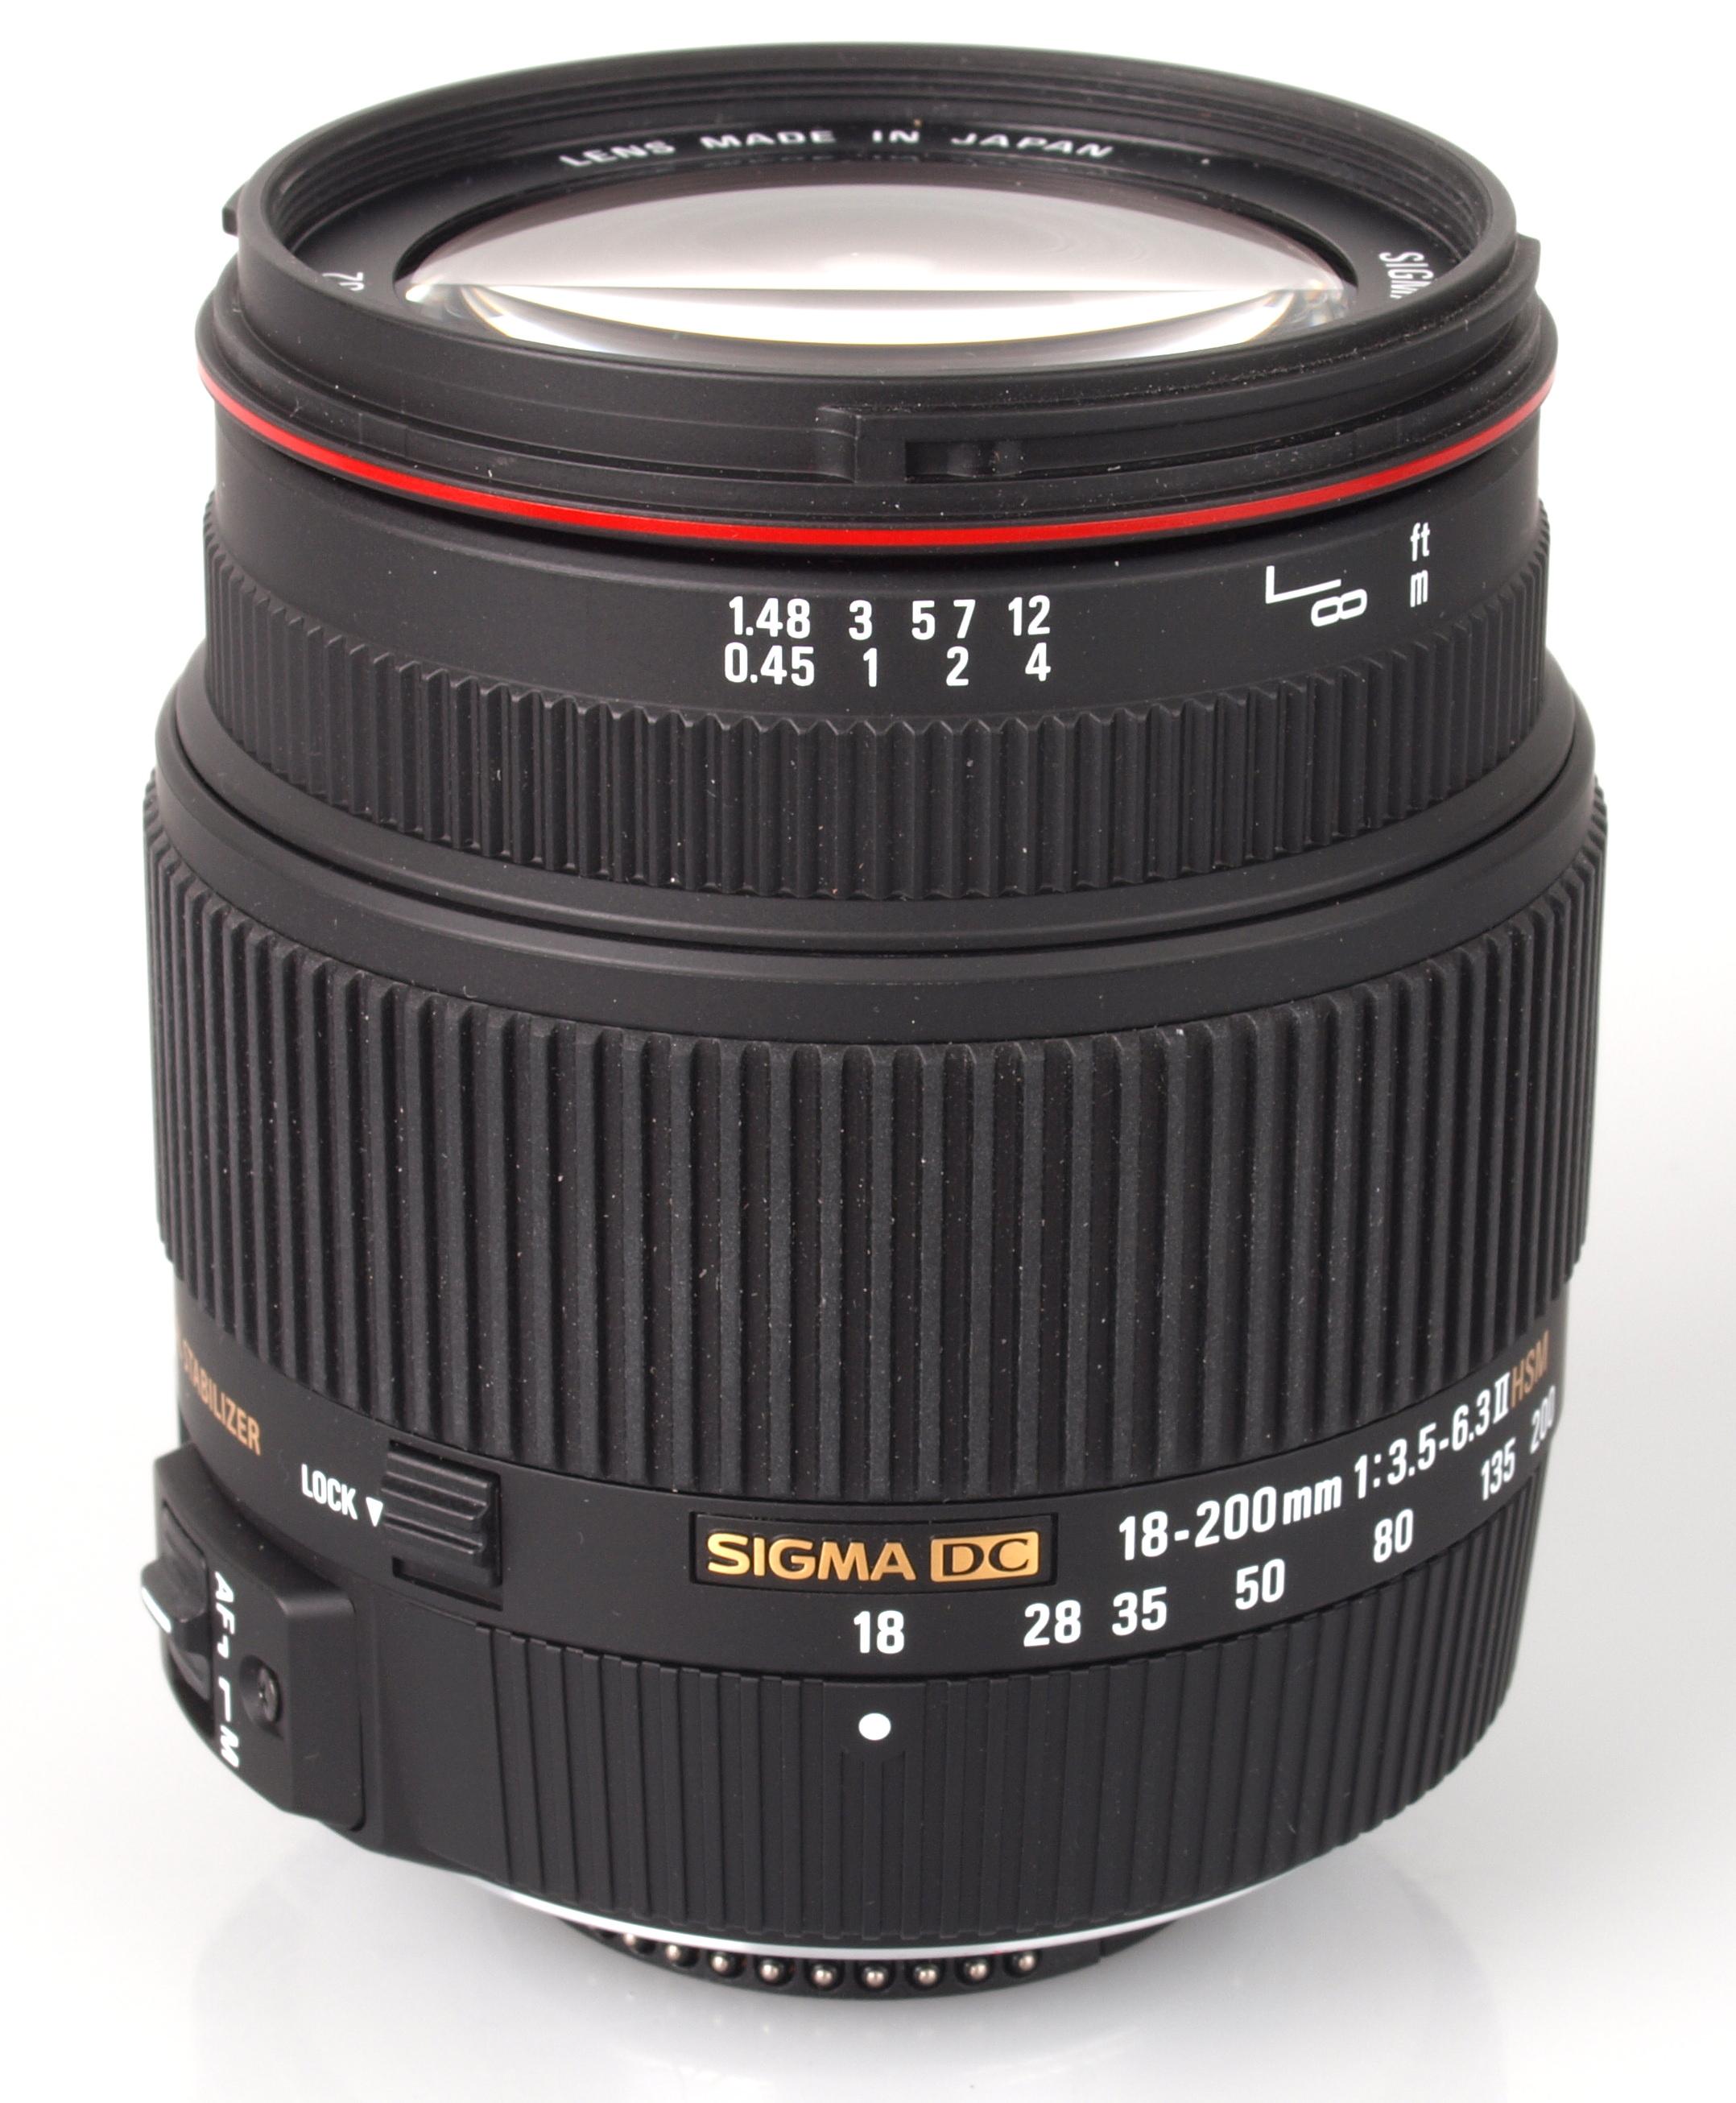 Amazon.com : Sigma 18-200mm f/3.5-6.3 DC Auto Focus OS (Optical ...